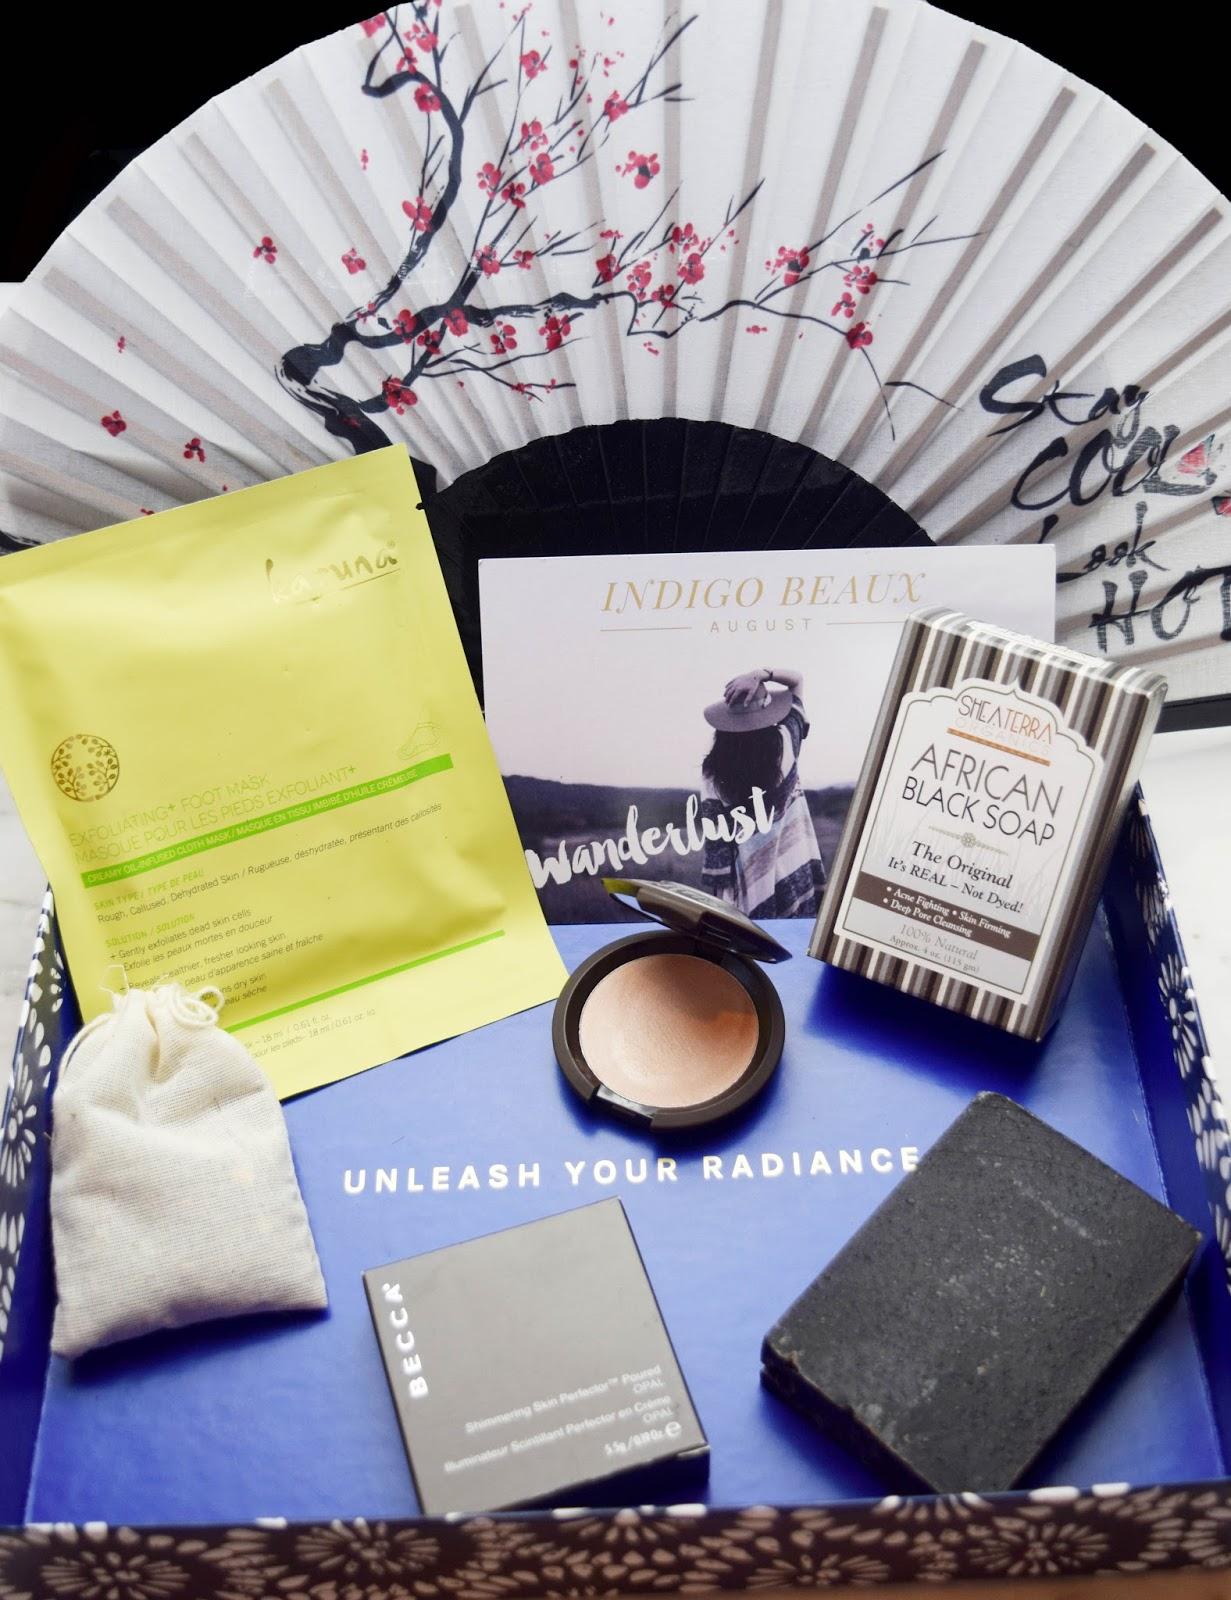 subcription box, ingigo beaux, must have, becca cosmetics, black soap, ingido beaux subscription box